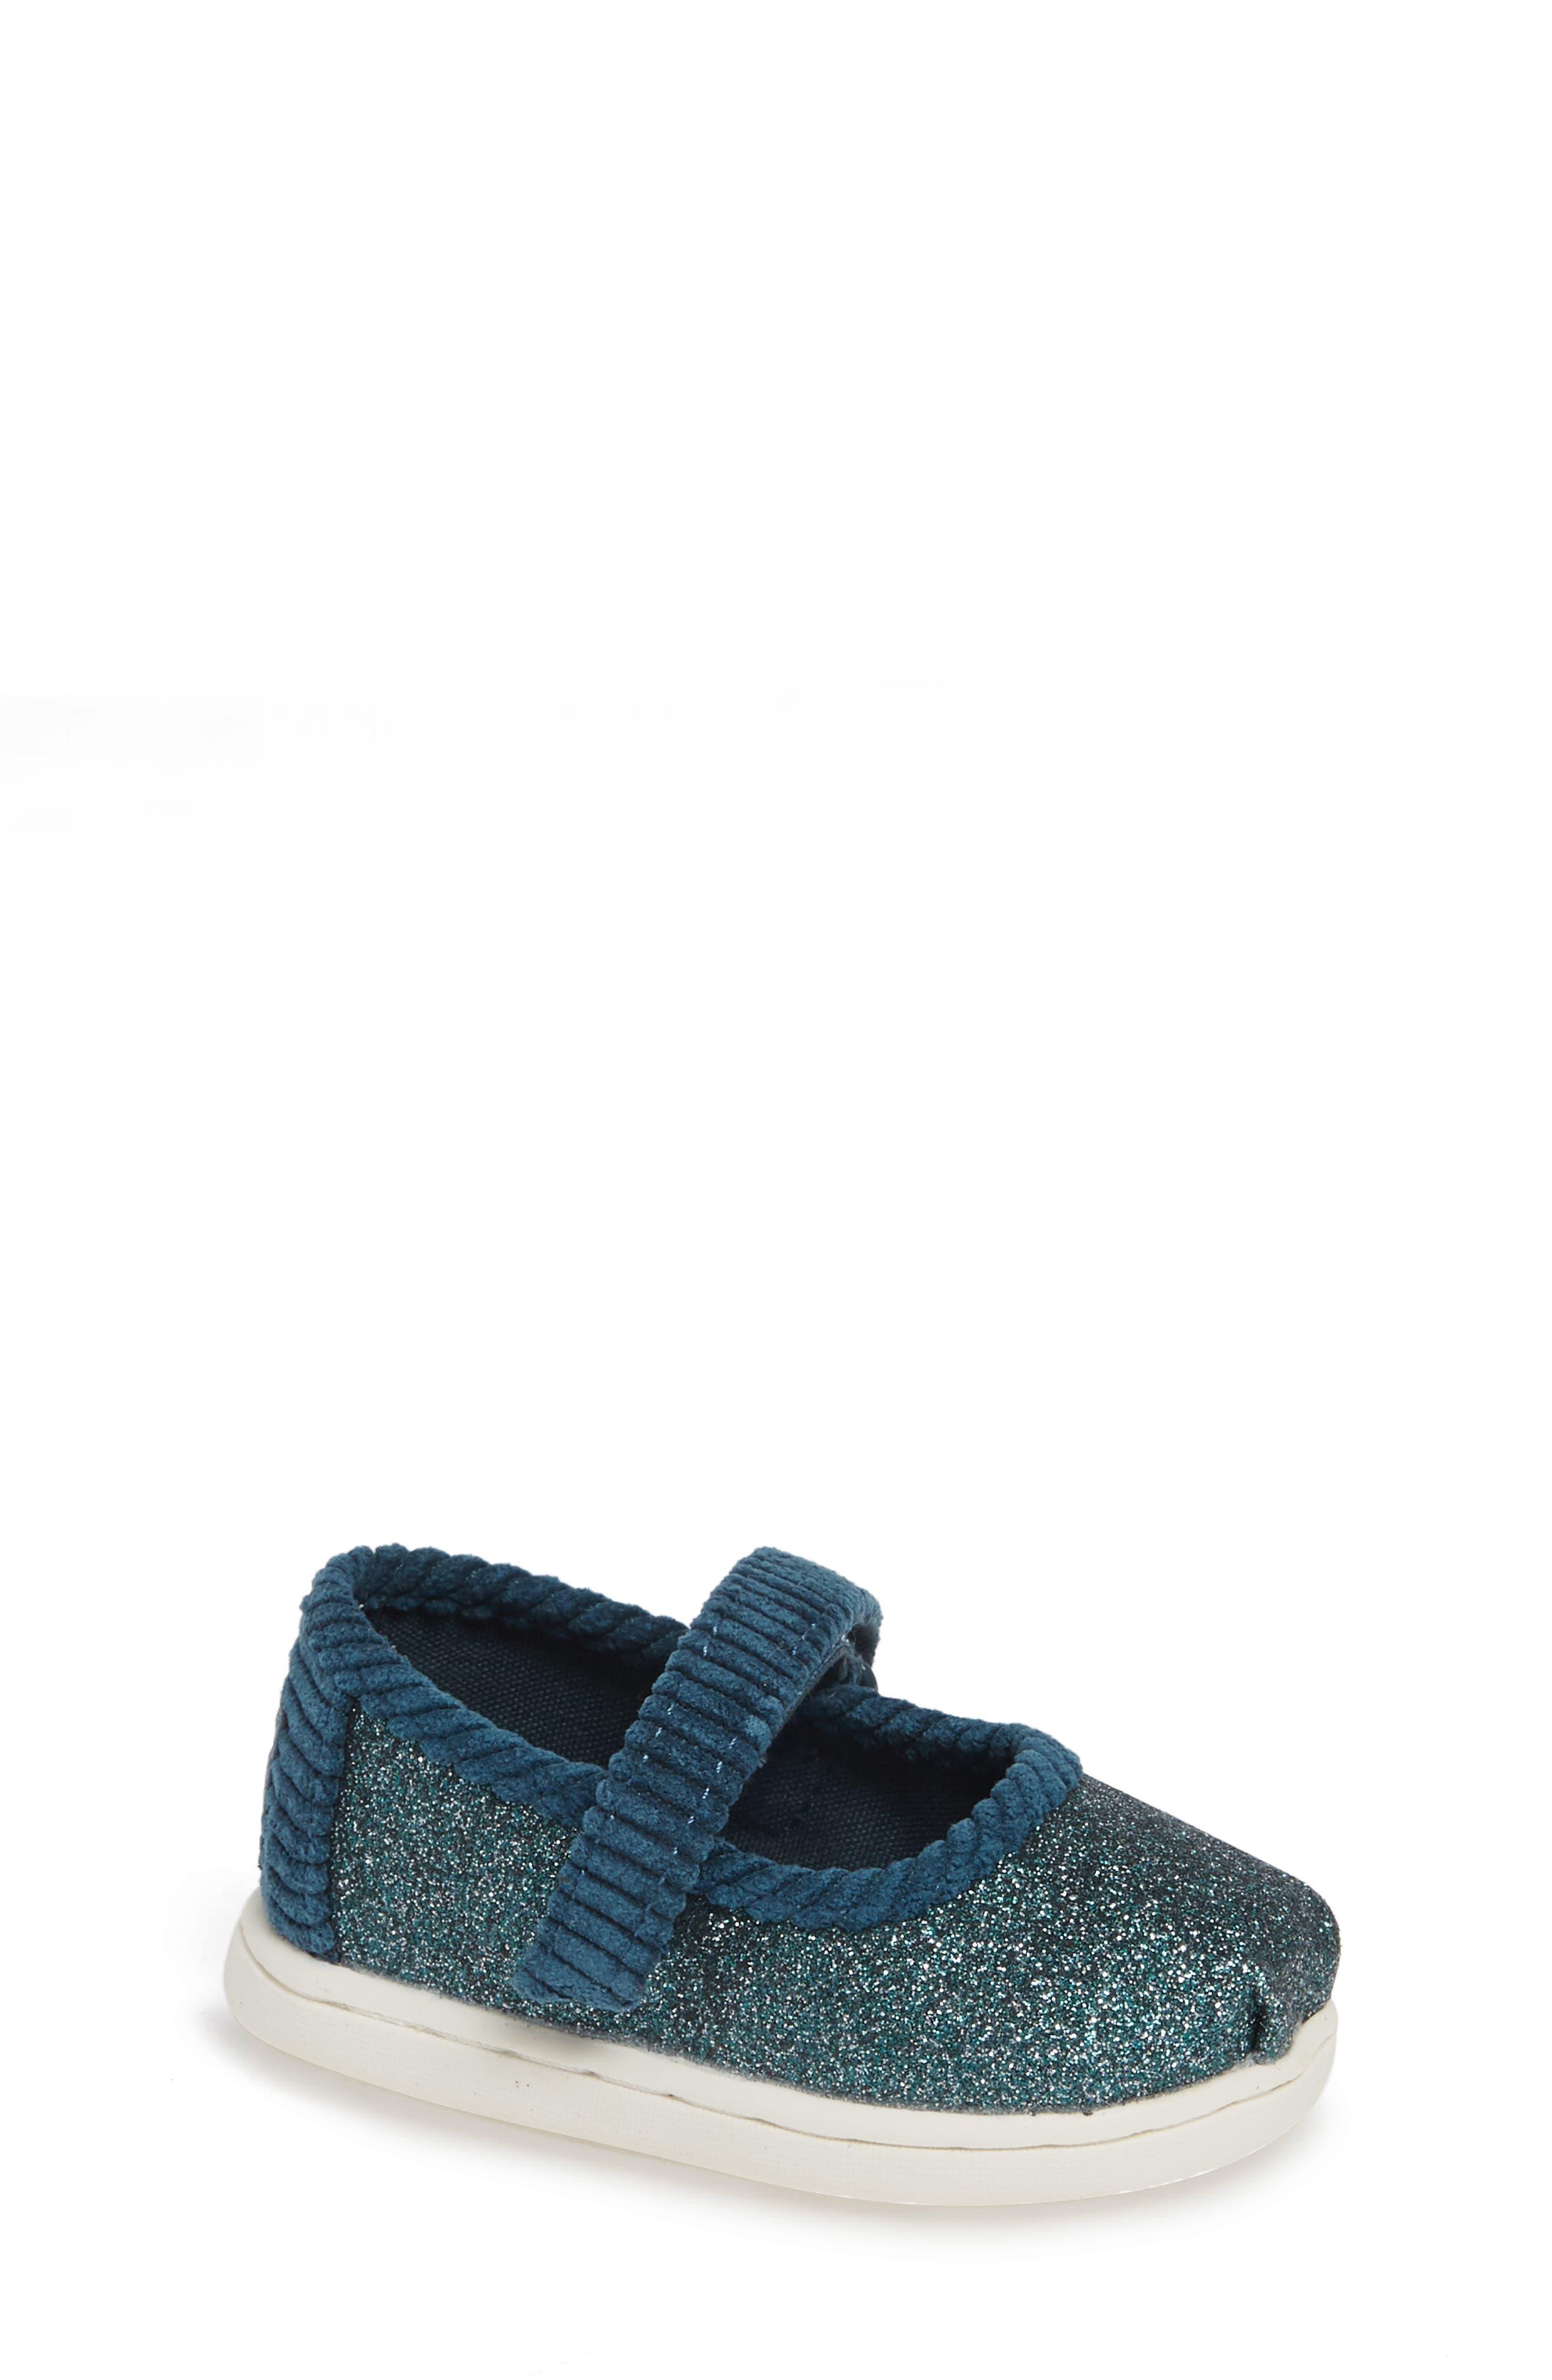 Mary Jane Sneaker,                             Main thumbnail 1, color,                             ATLANTIC IRIDESCENT/ CORDUROY